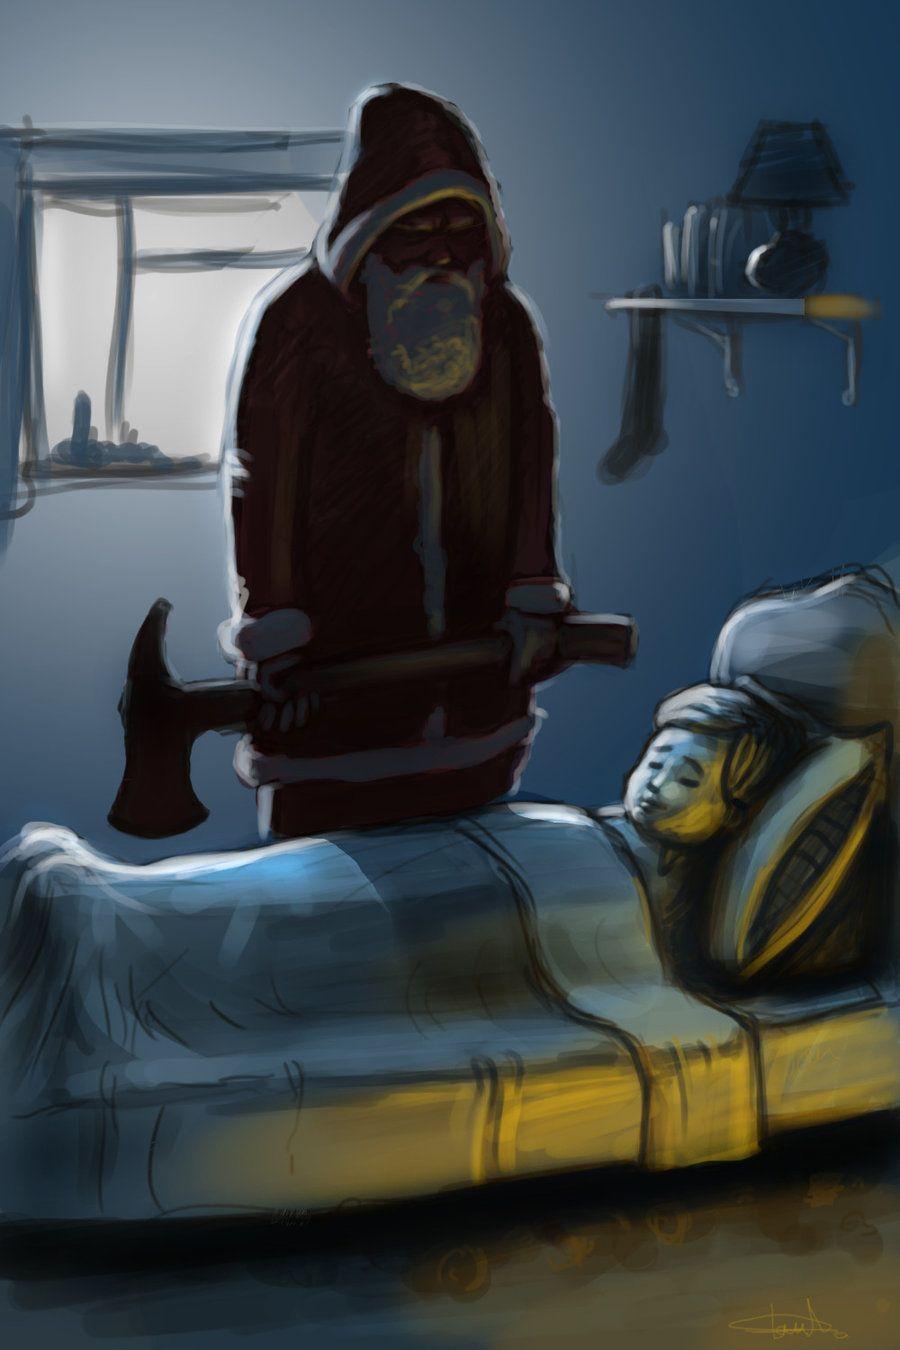 Bad Santa By Mrtomlong On Deviantart Bad Santa Creepy Christmas Scary Christmas